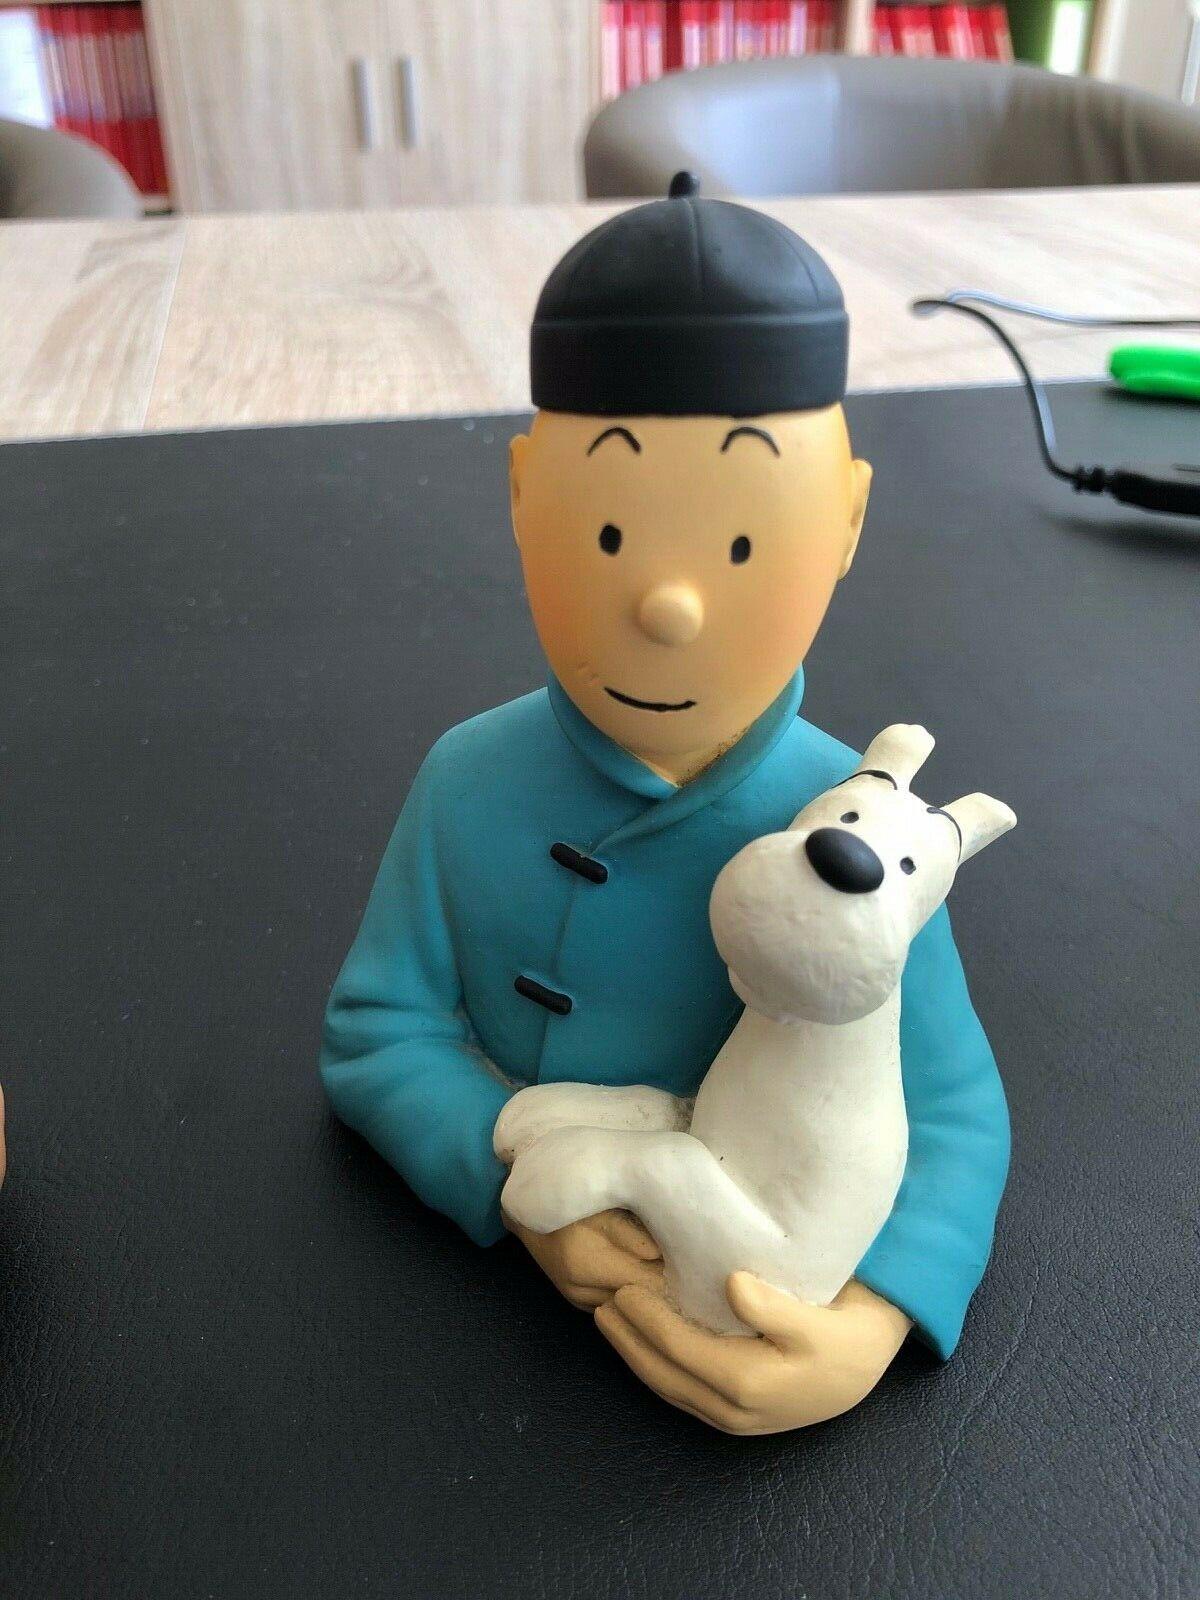 TINTIN PIXI REGOUT - Buste Tintin Lotus Bleu avec certificat vignette No Leblon